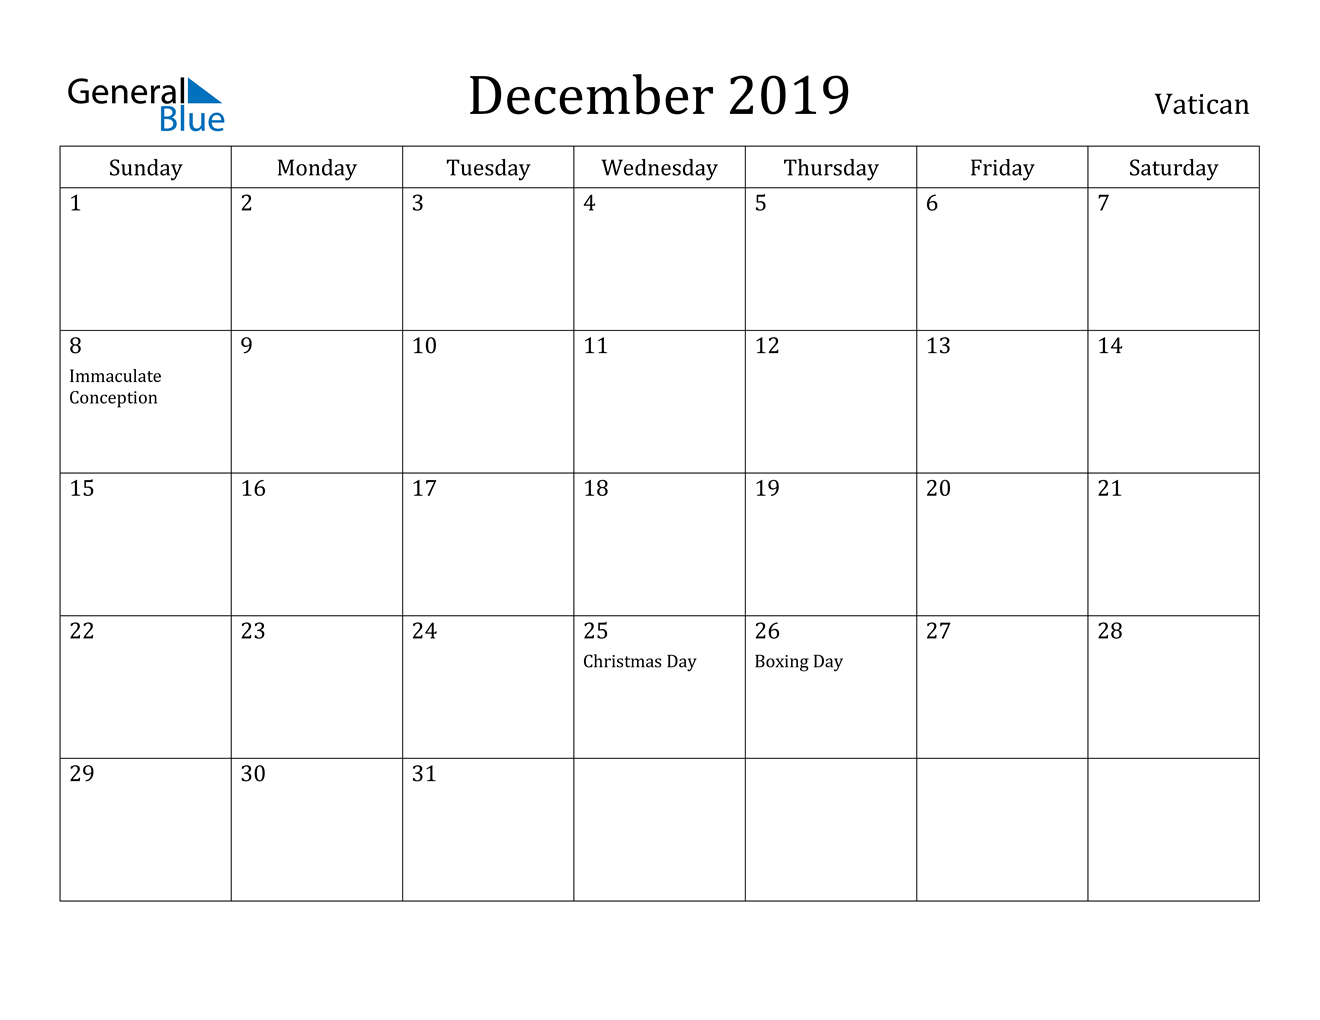 Image of December 2019 Vatican Calendar with Holidays Calendar